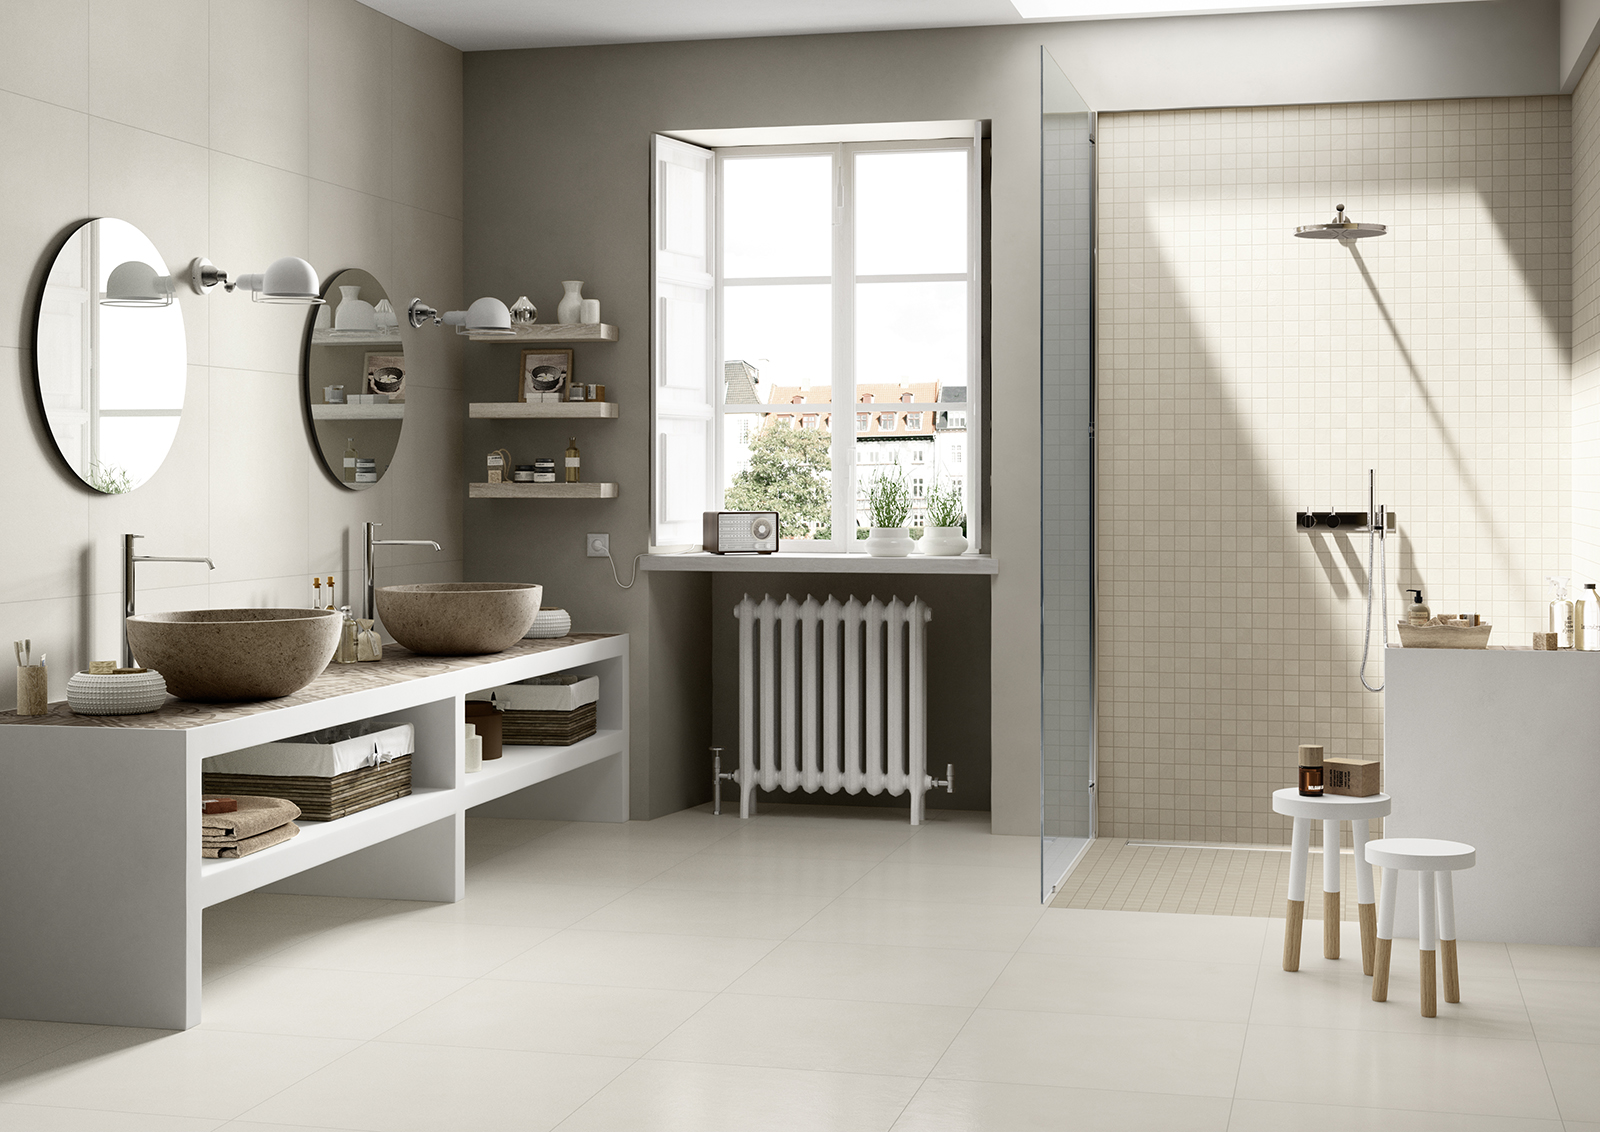 Carrelage salle de bain c ramique et gr s c rame marazzi for Marazzi bagno